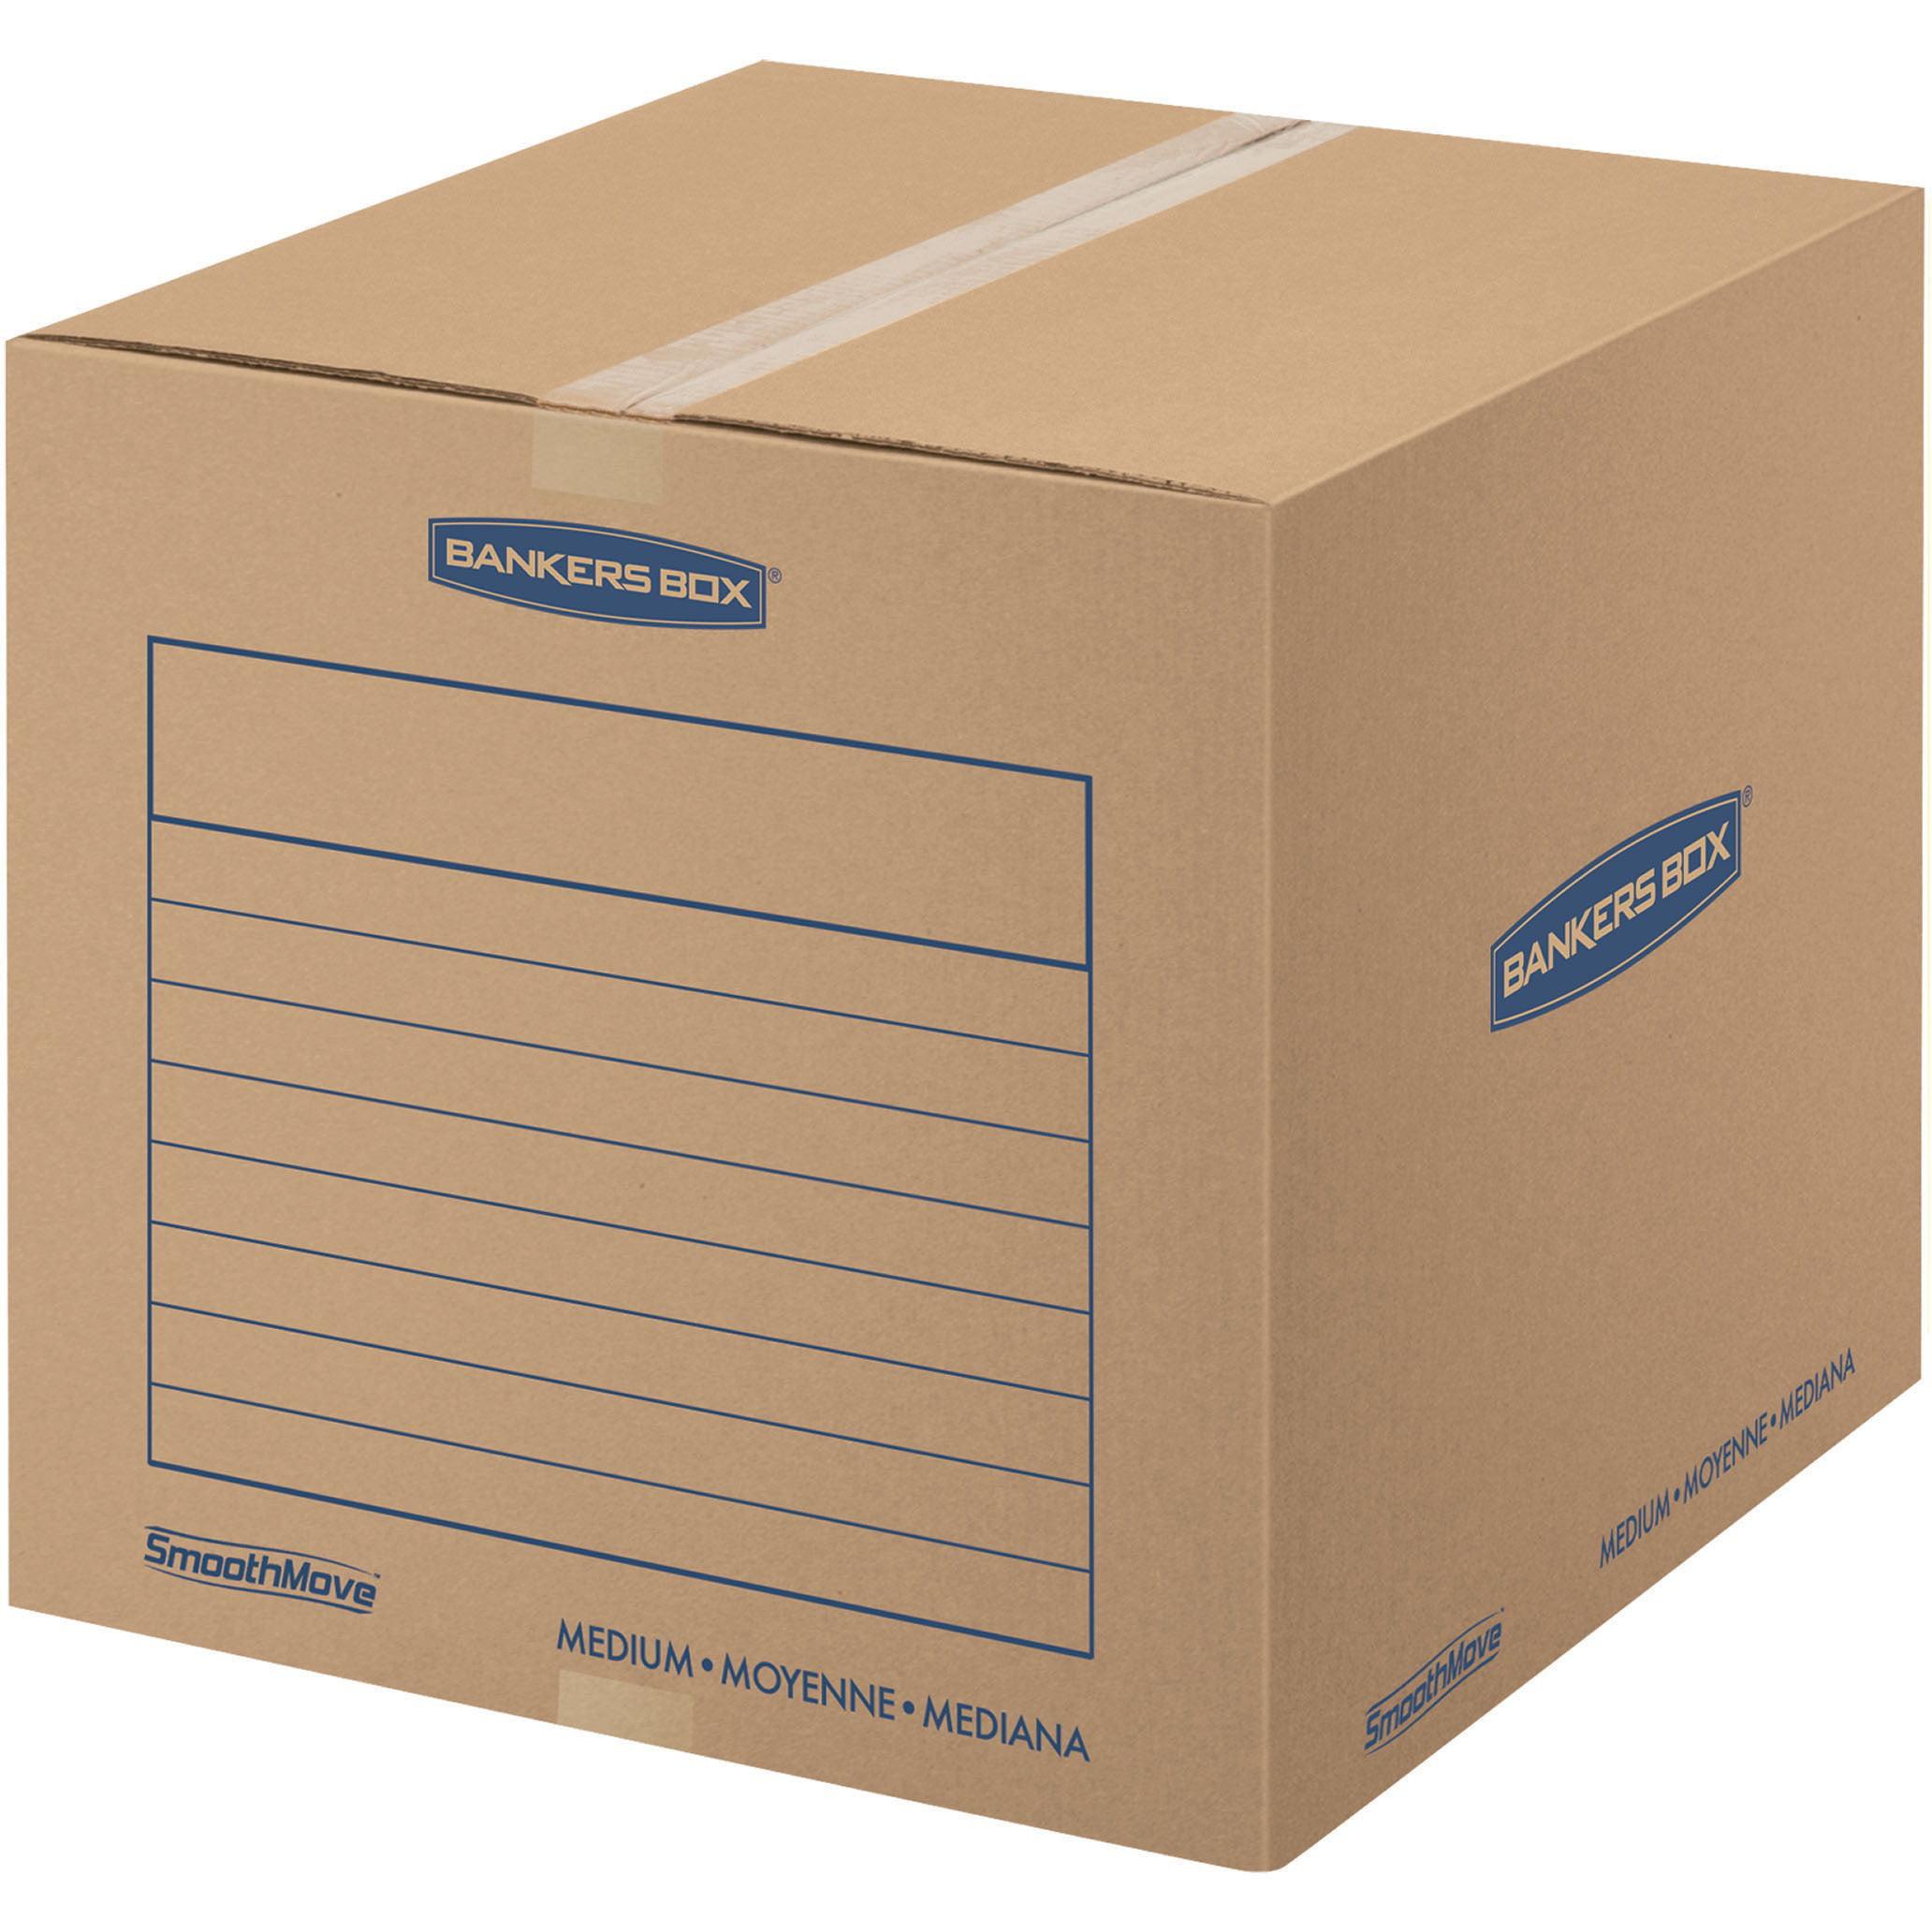 Bankers Box SmoothMove Basic Storage and Moving Boxes, Medium, 20pk